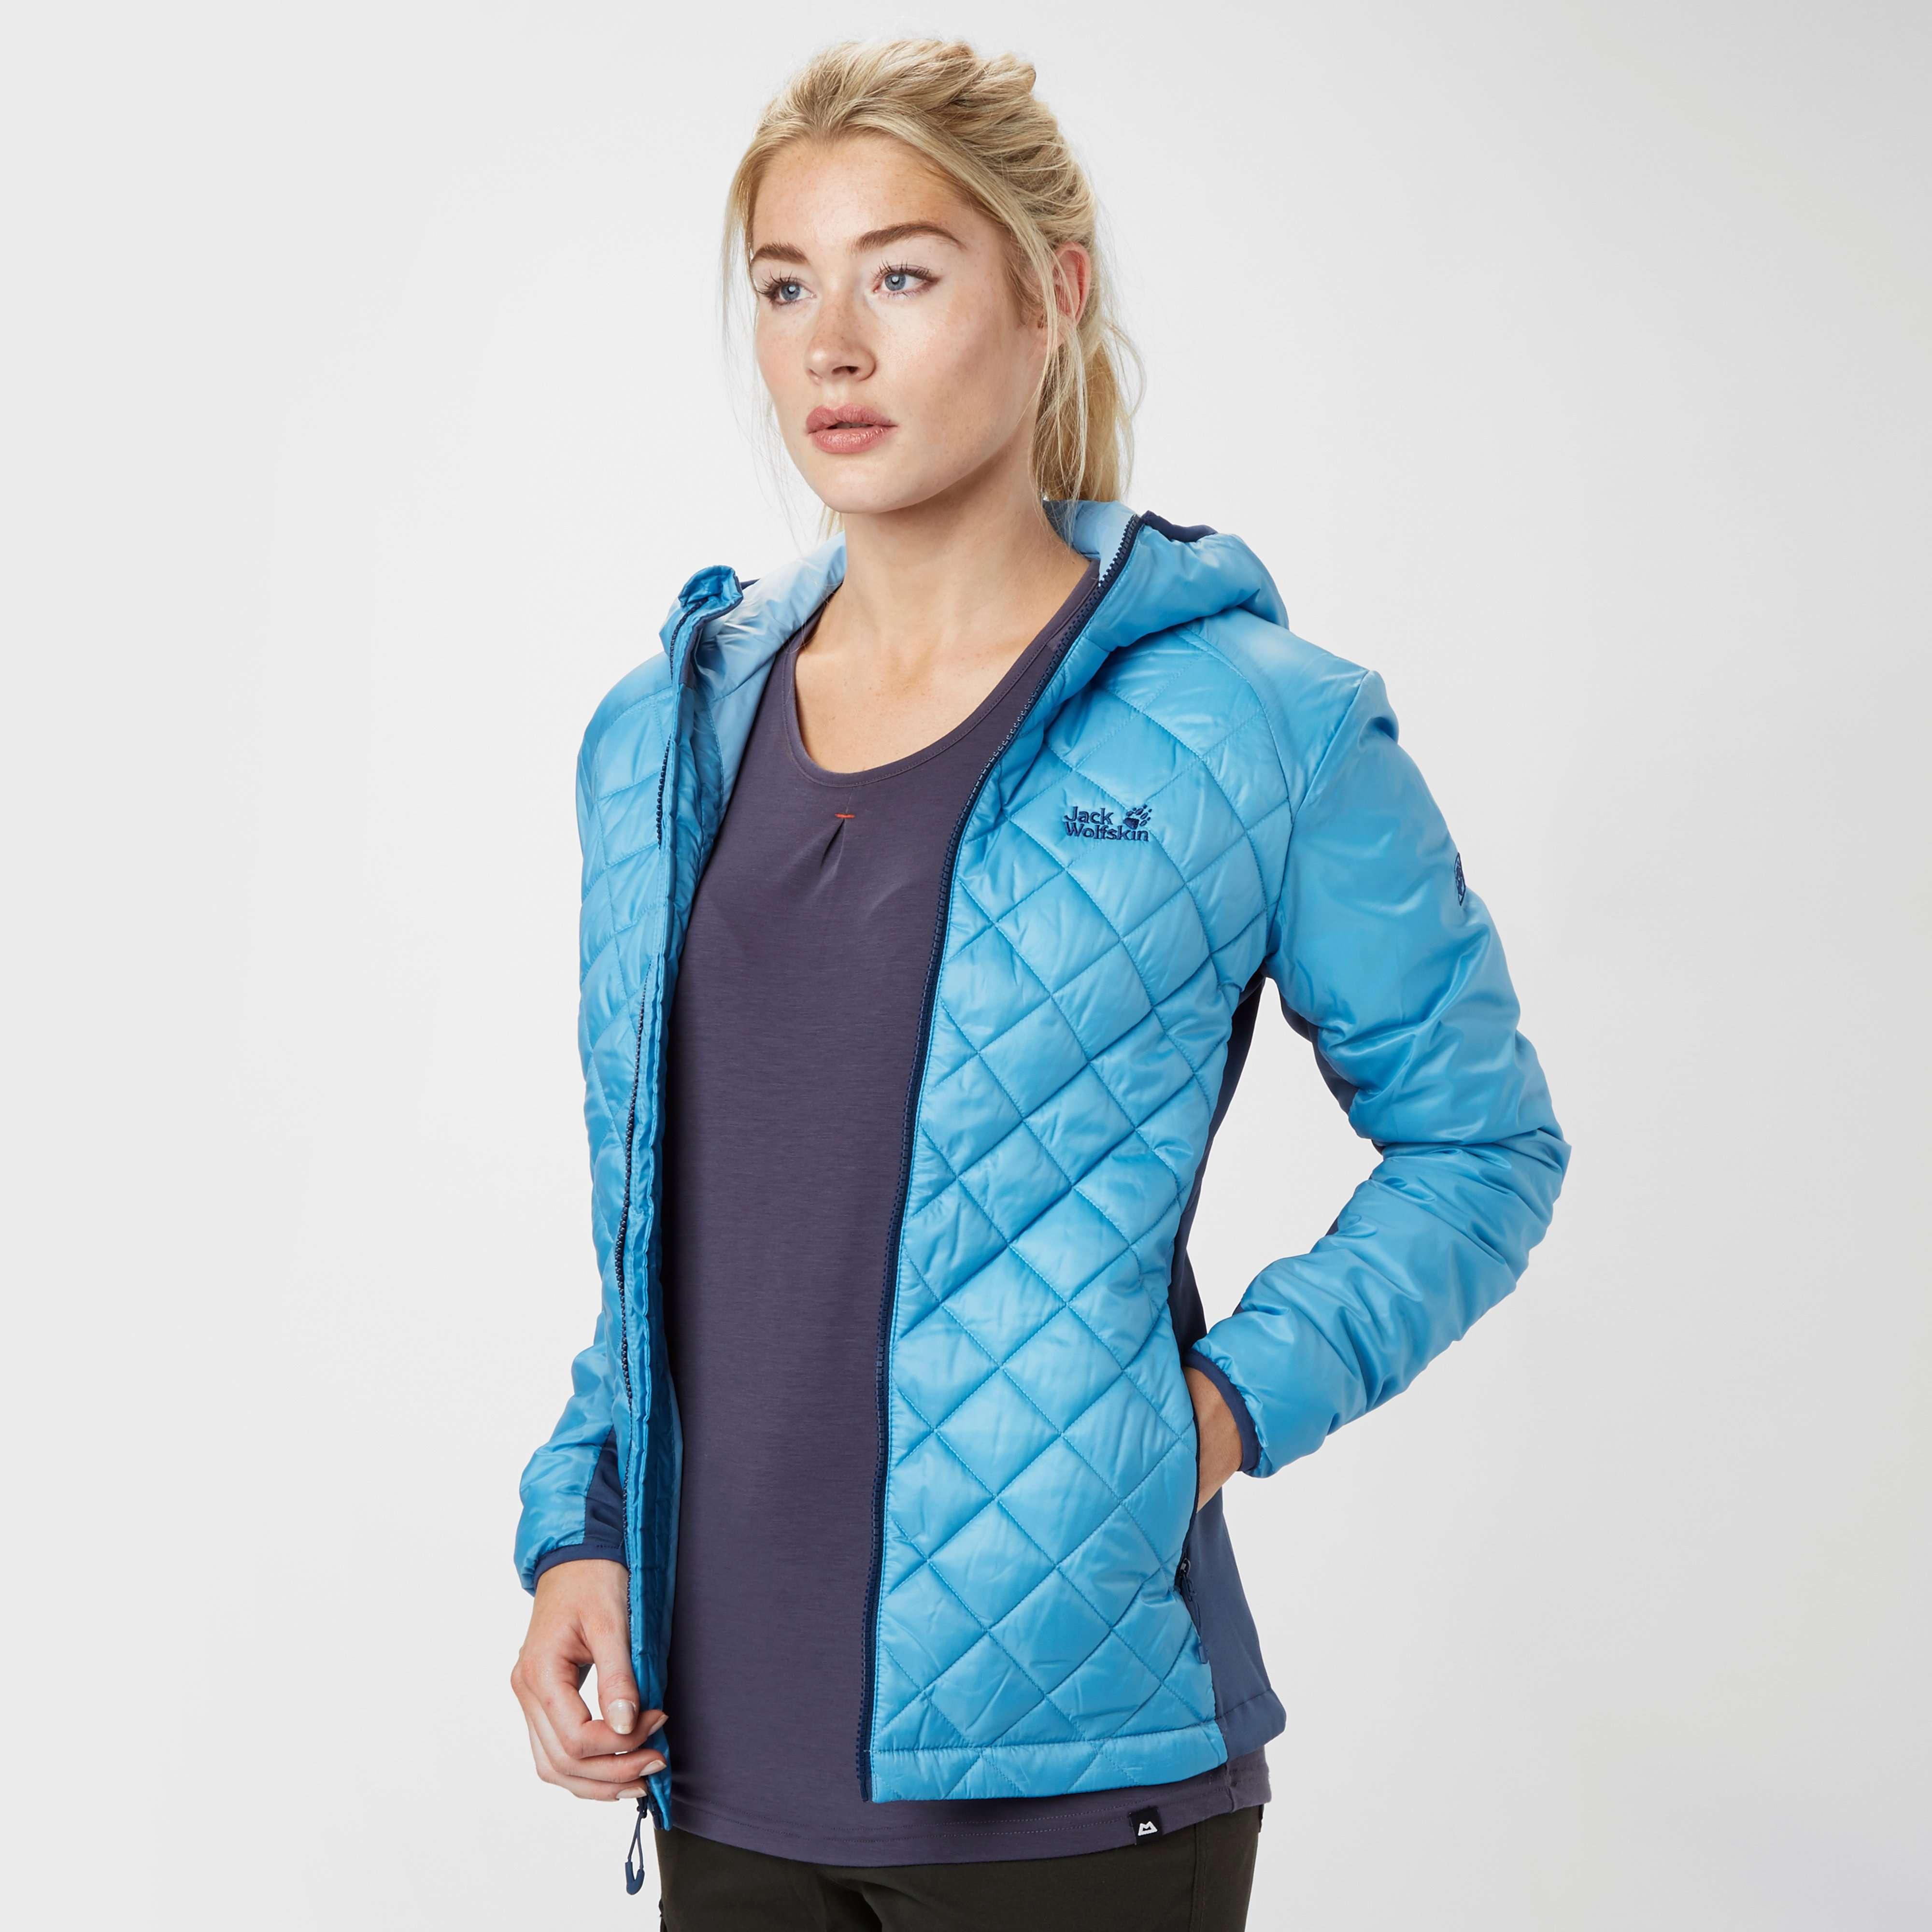 JACK WOLFSKIN Women's Icy Tundra Insulated Jacket